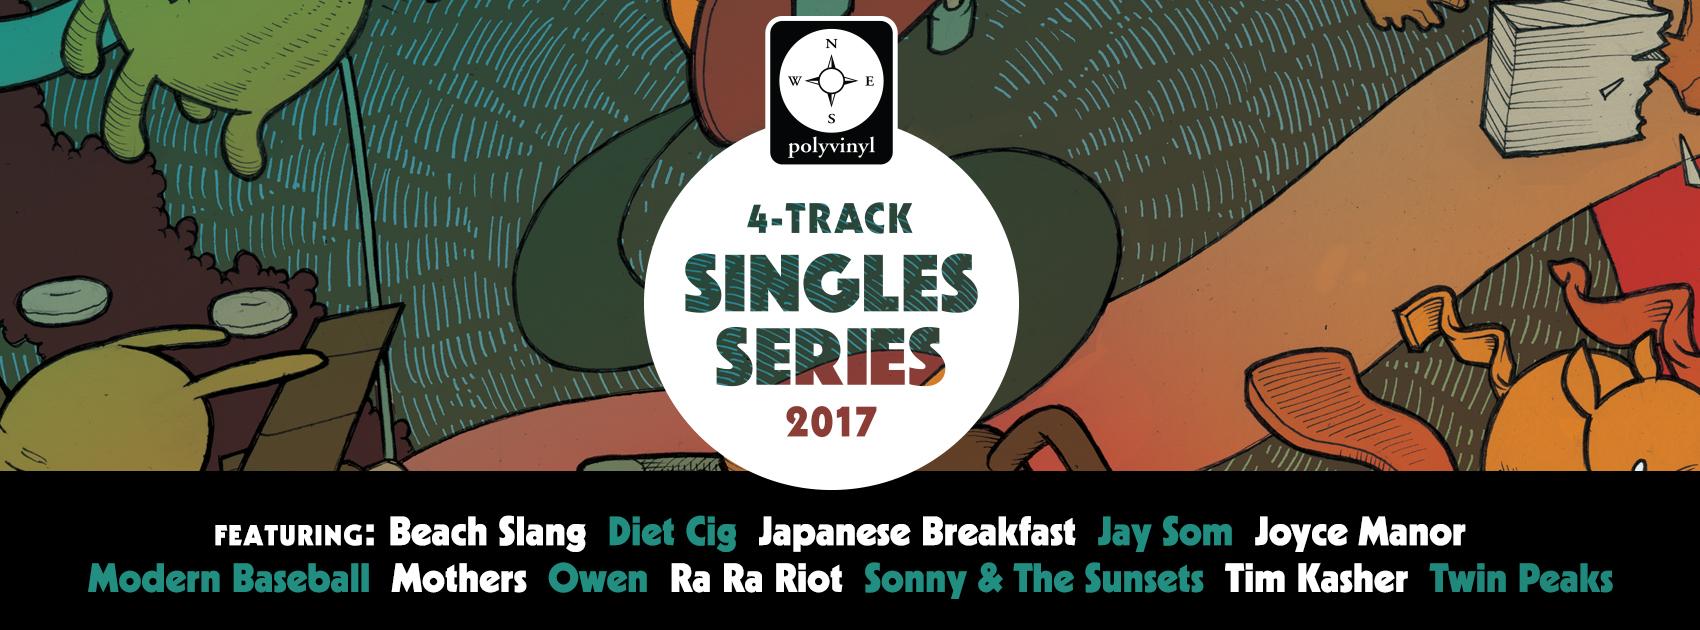 2017 4-Track Singles Series